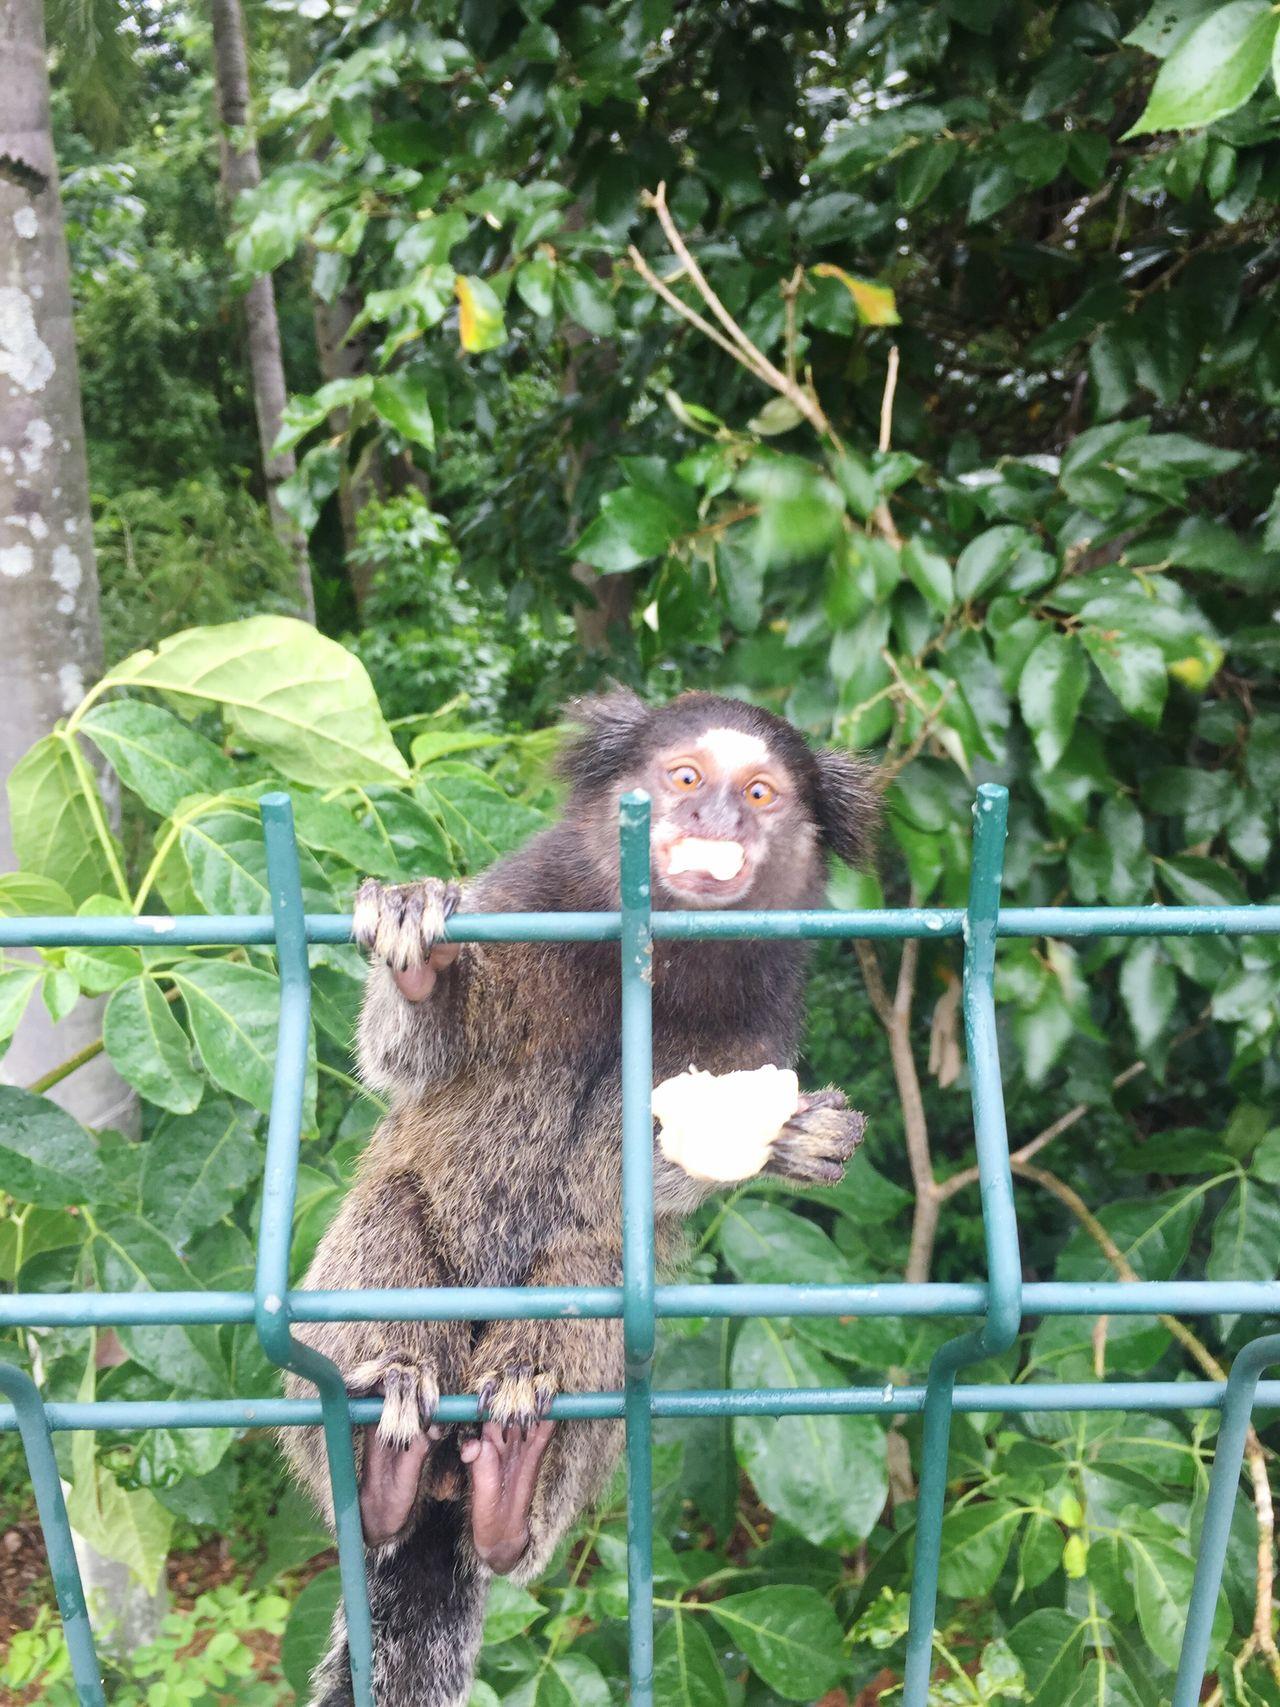 Monkey Green Color Animal Themes Outdoors Nature Mammal Tree Leaf Food Wildlife Brazil Brazil Natural Beauty Brasil Brasilnature Primate Forest